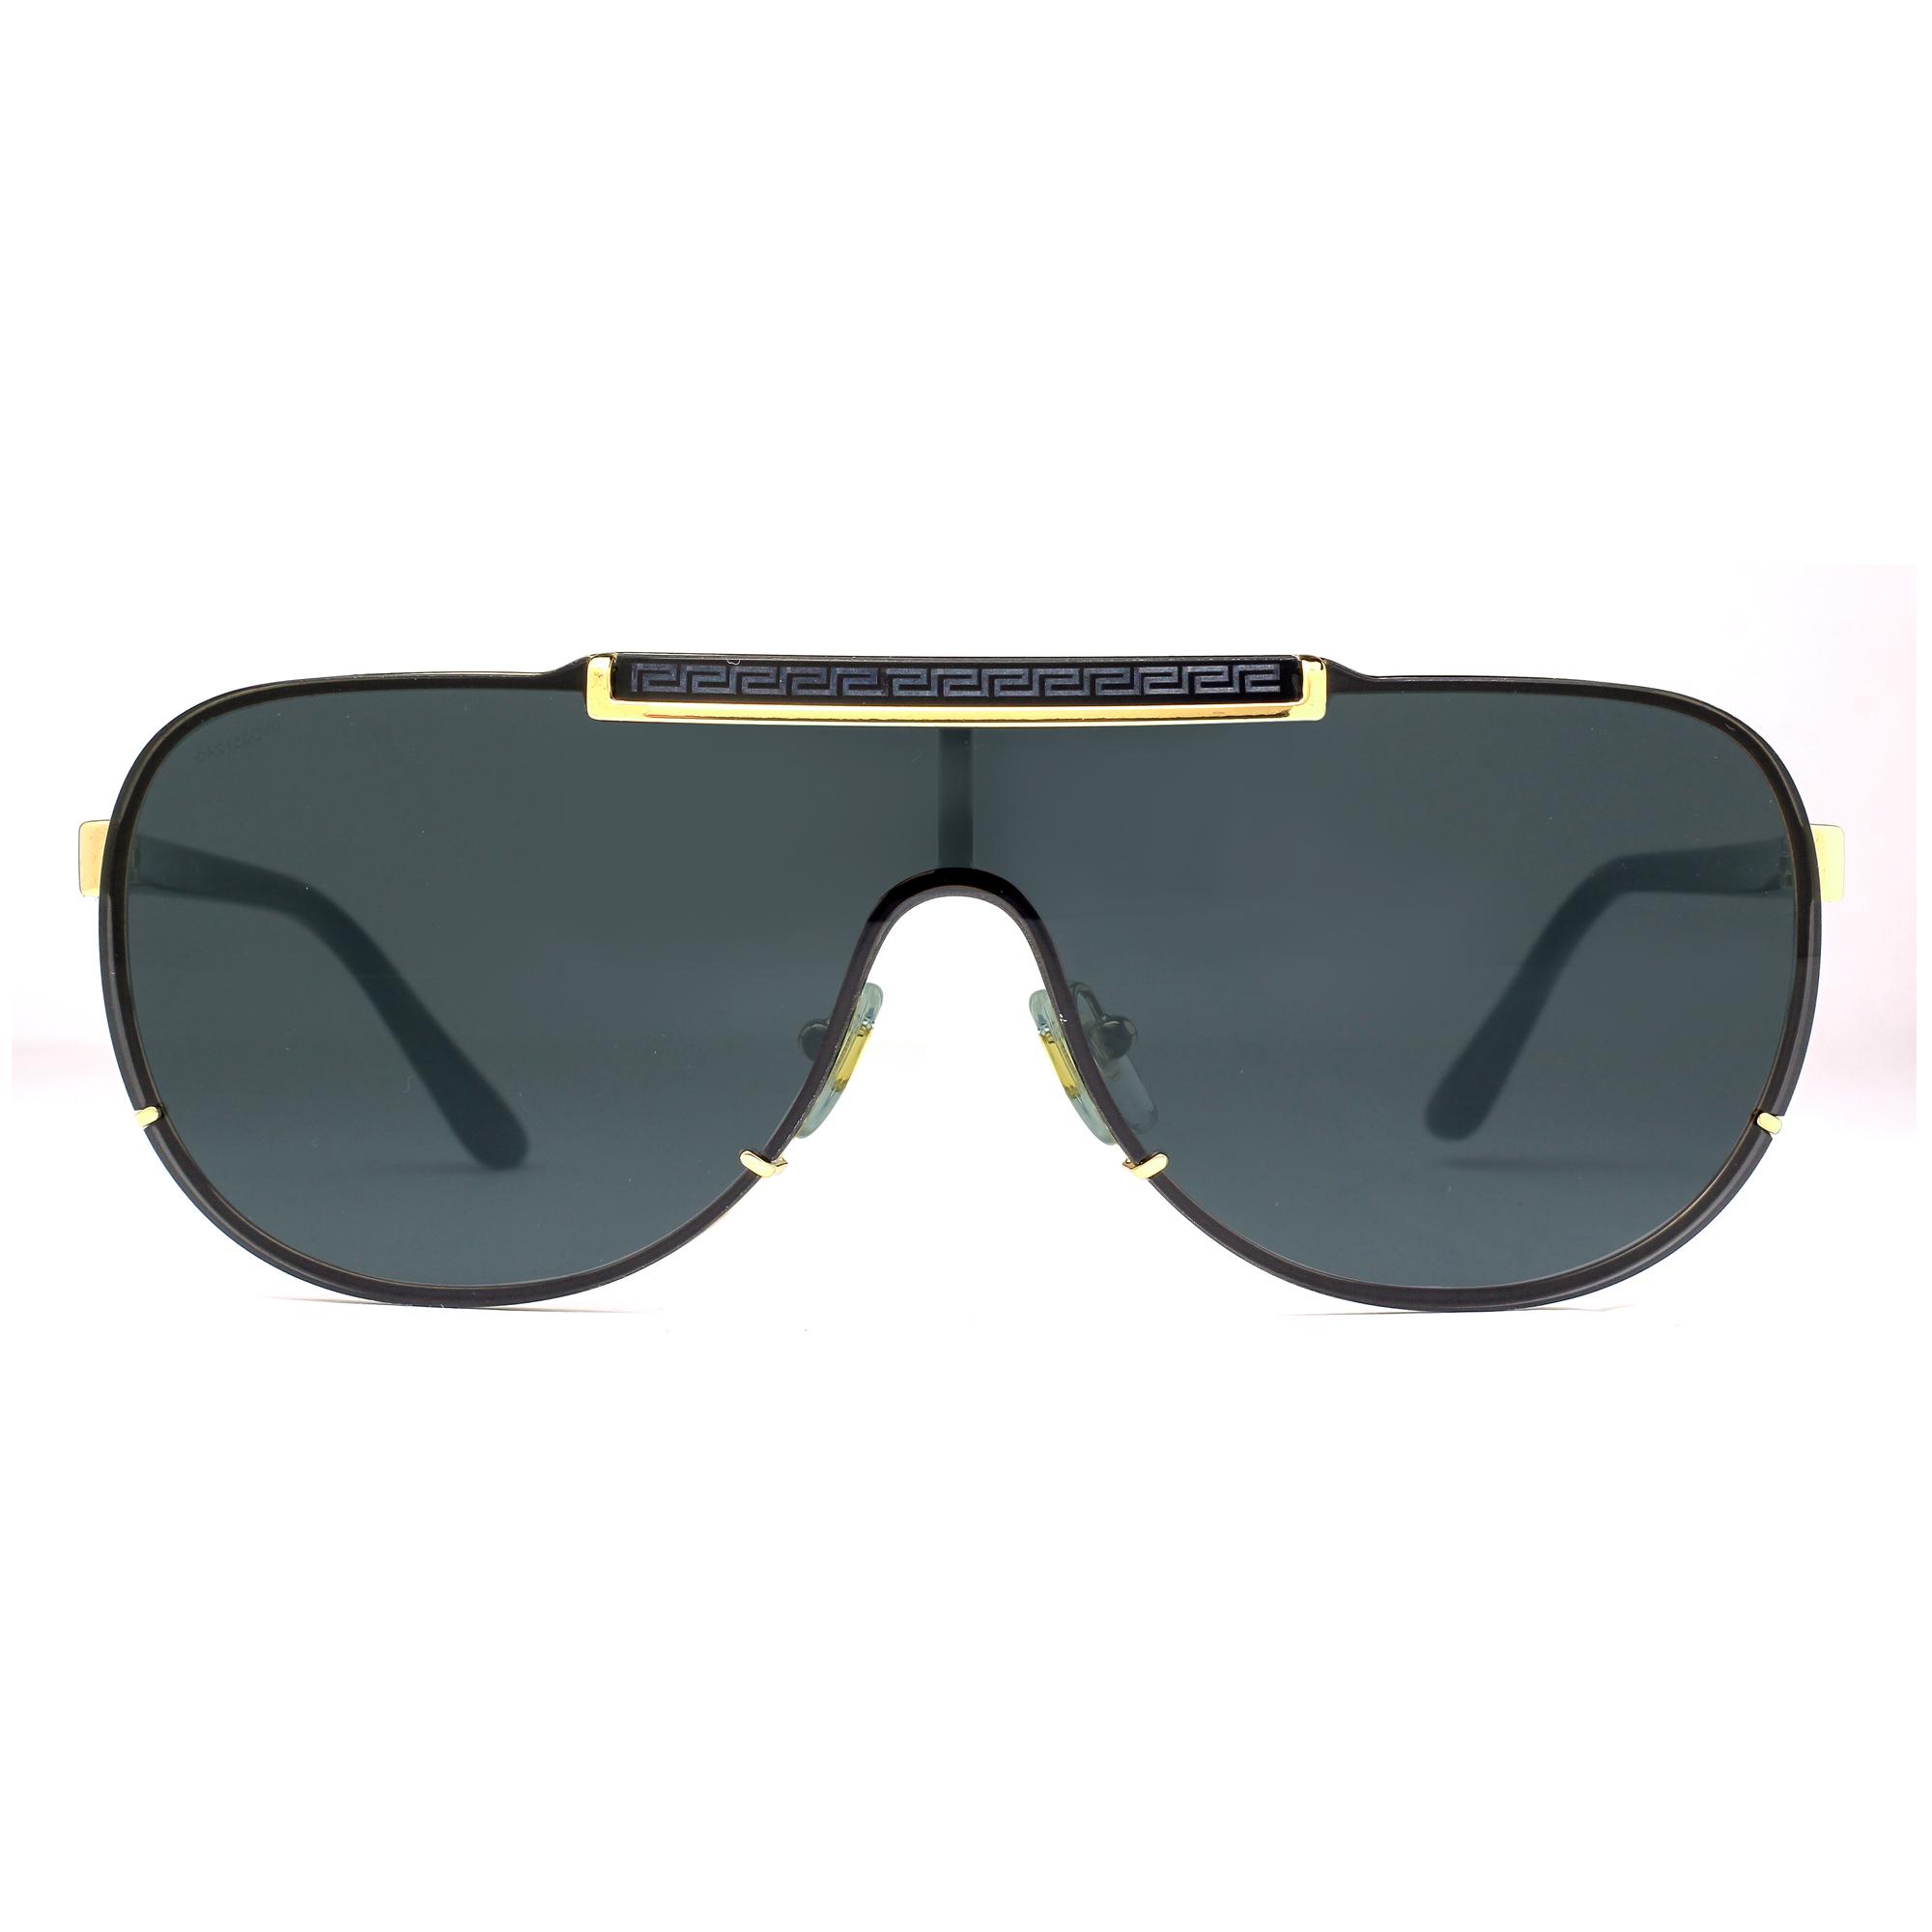 99942bd16729 Versace Ve 2140 Sunglasses